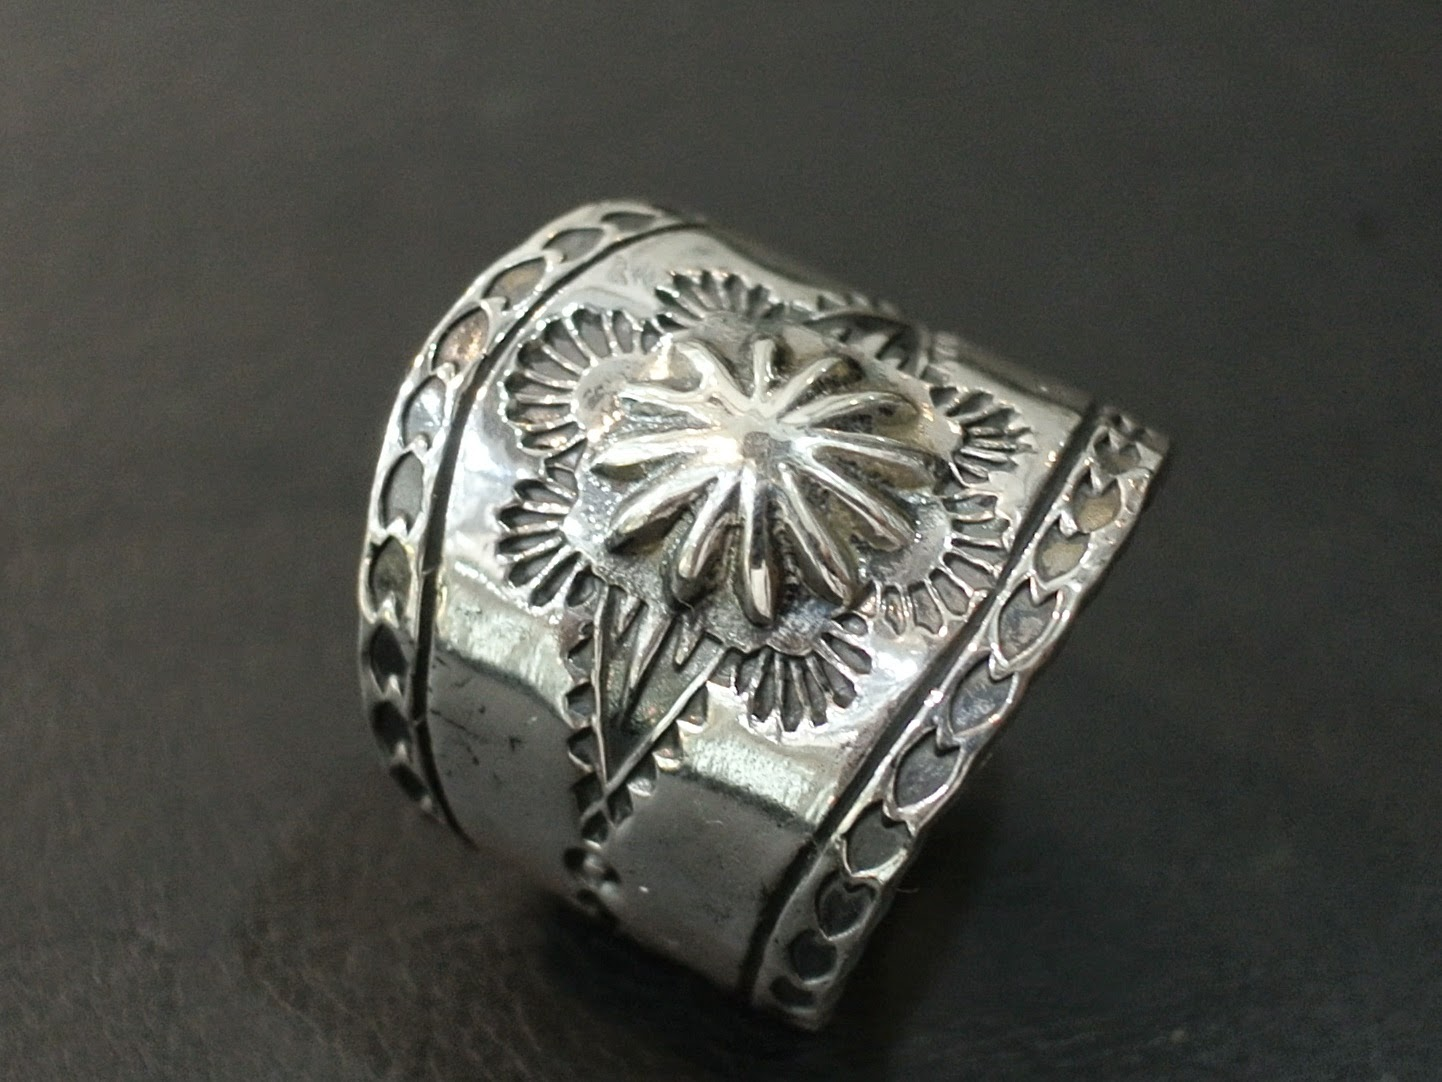 Dear Blossom - Concho Ring